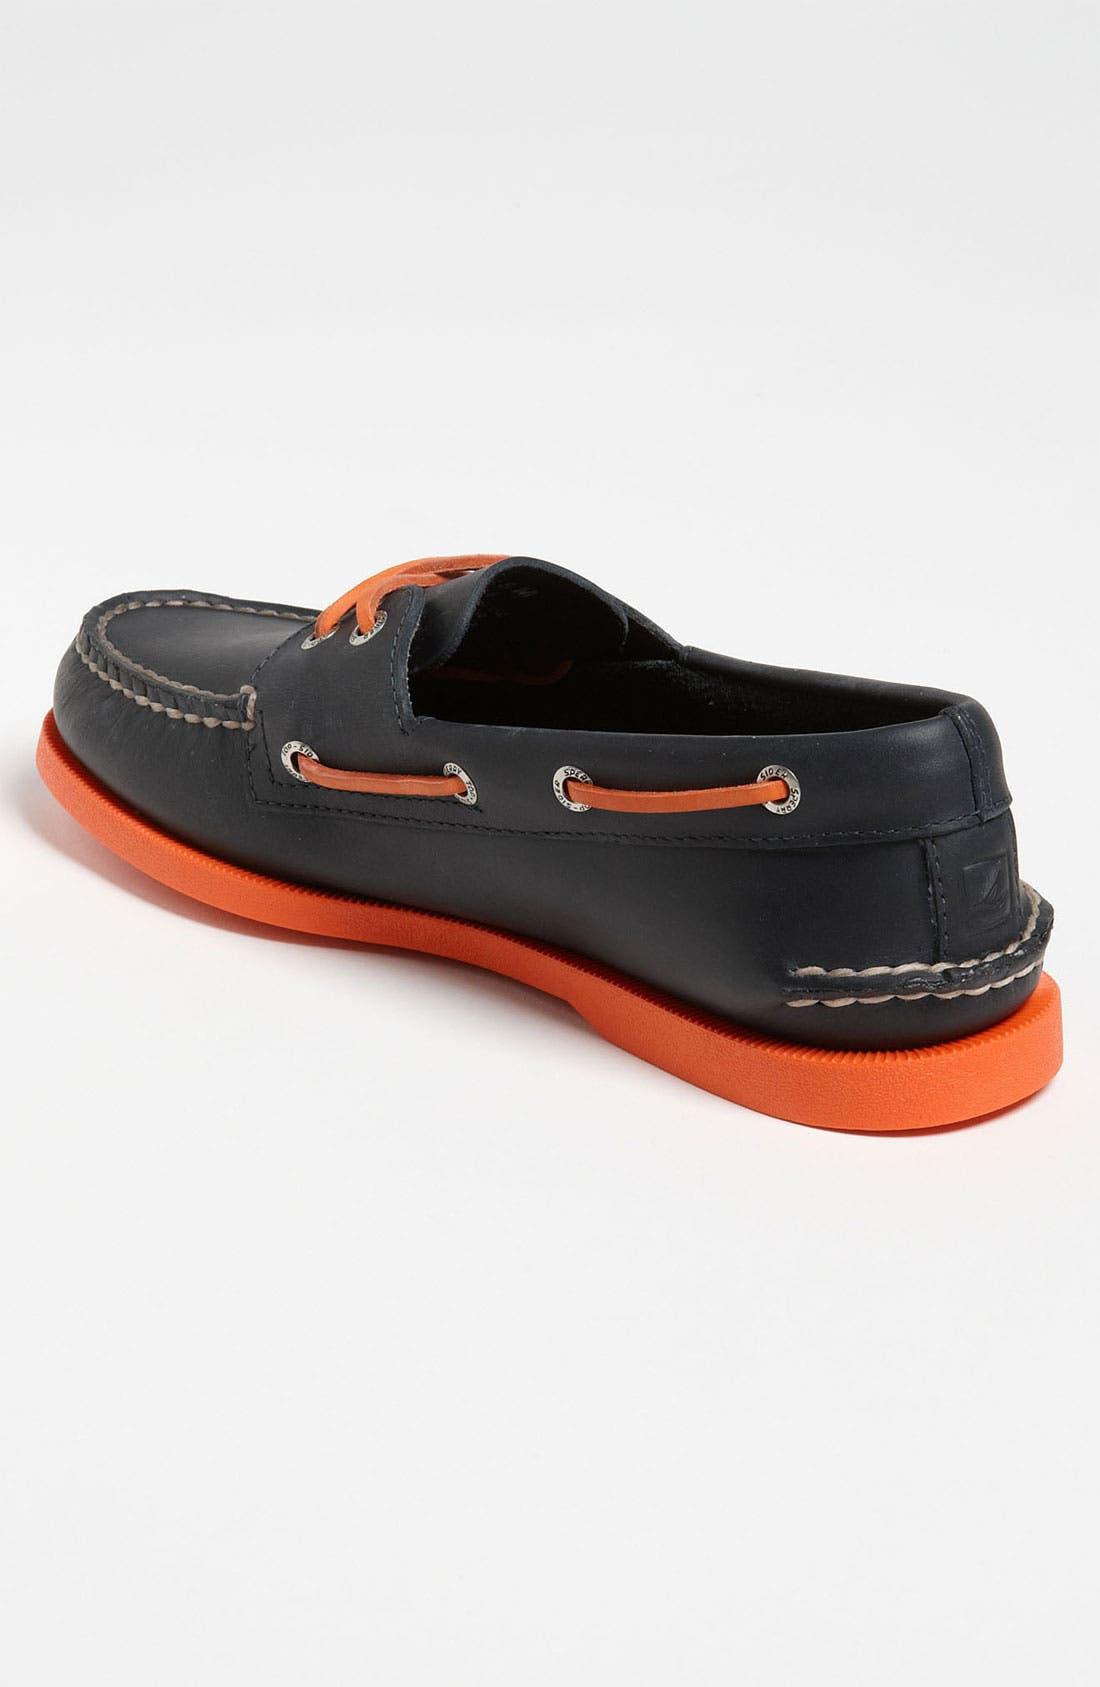 Alternate Image 2  - Sperry Top-Sider® 'Authentic Original 2-Eye' Boat Shoe (Regular Retail Price: $89.95)